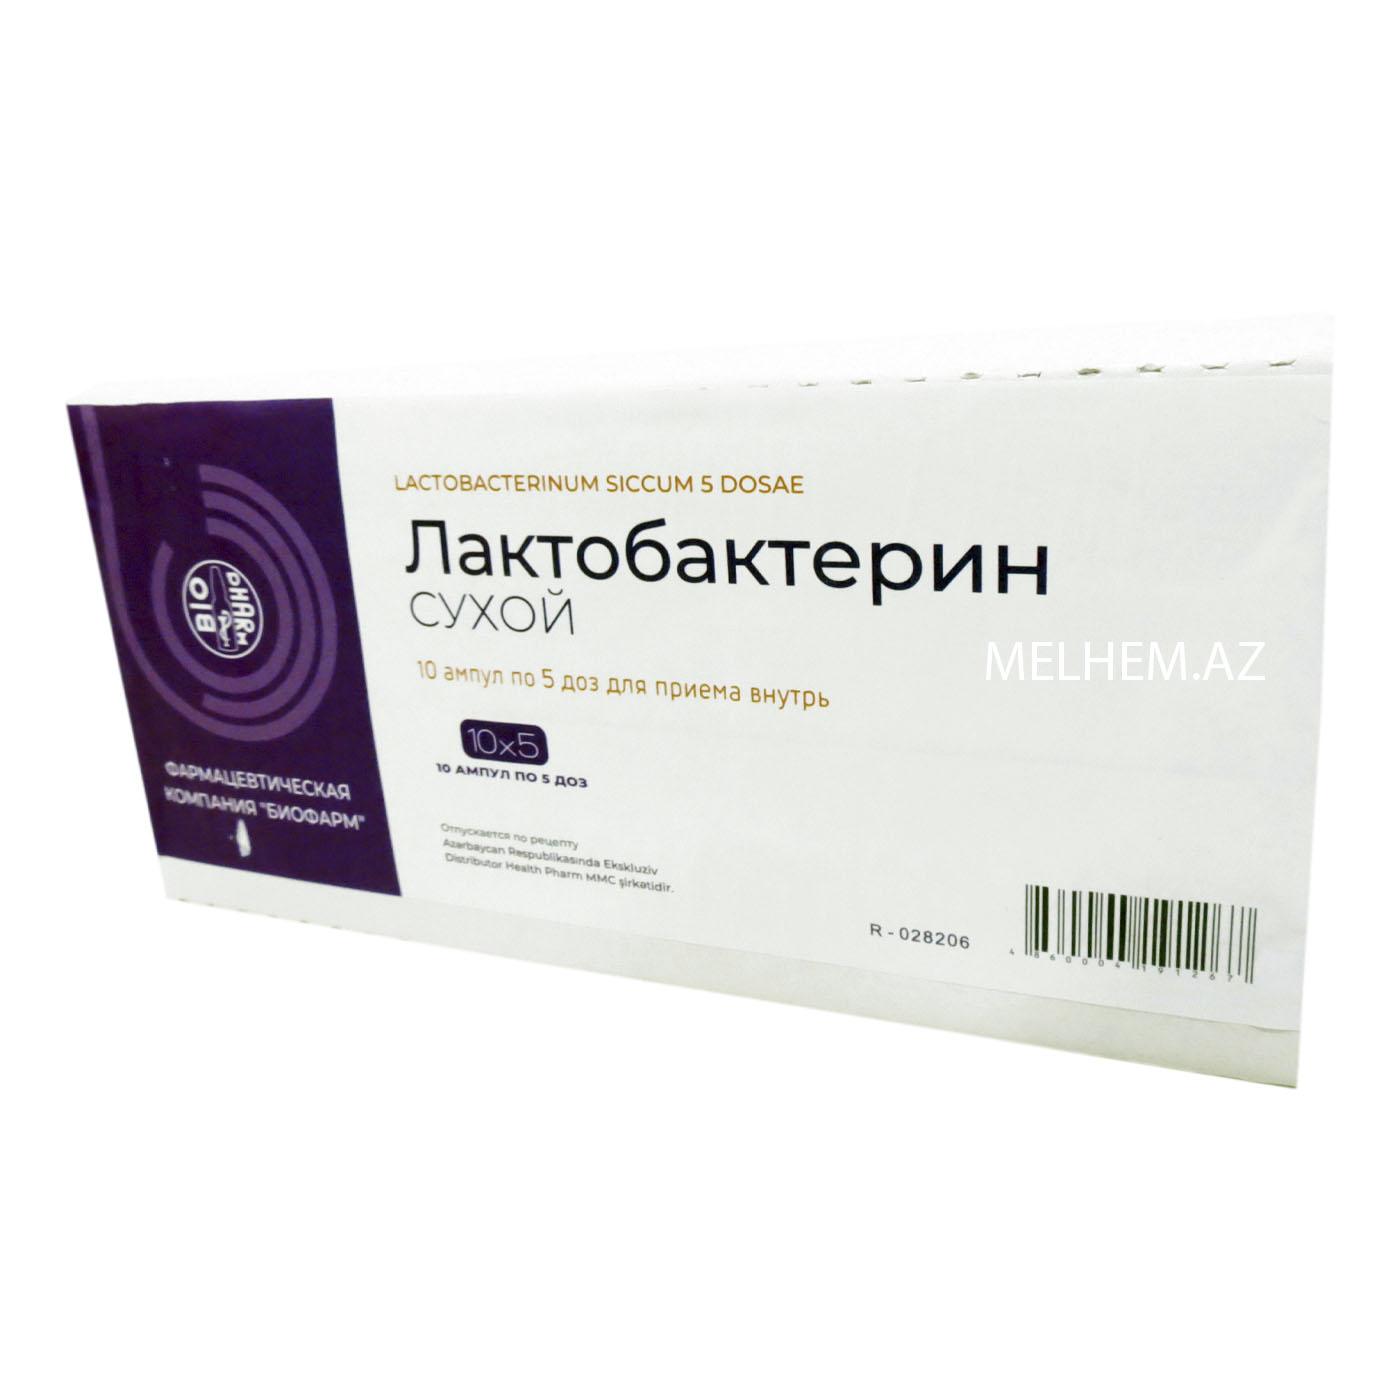 LAKTOBAKTERİN N10 X 5 (AMPULA)